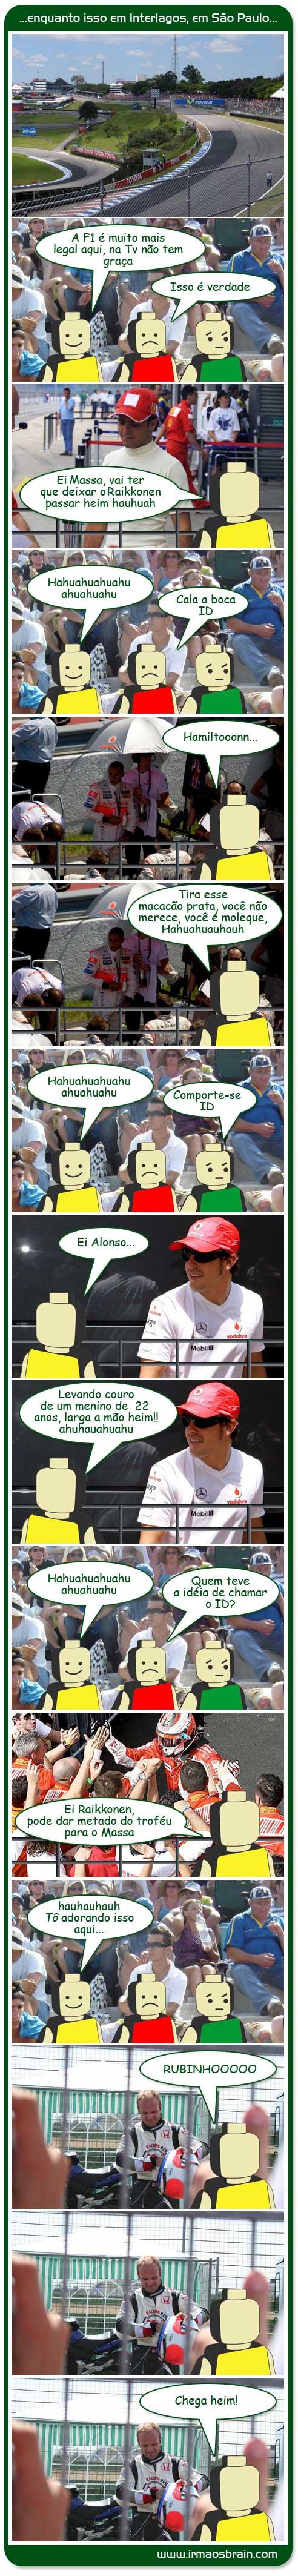 Formula 1 Brasil